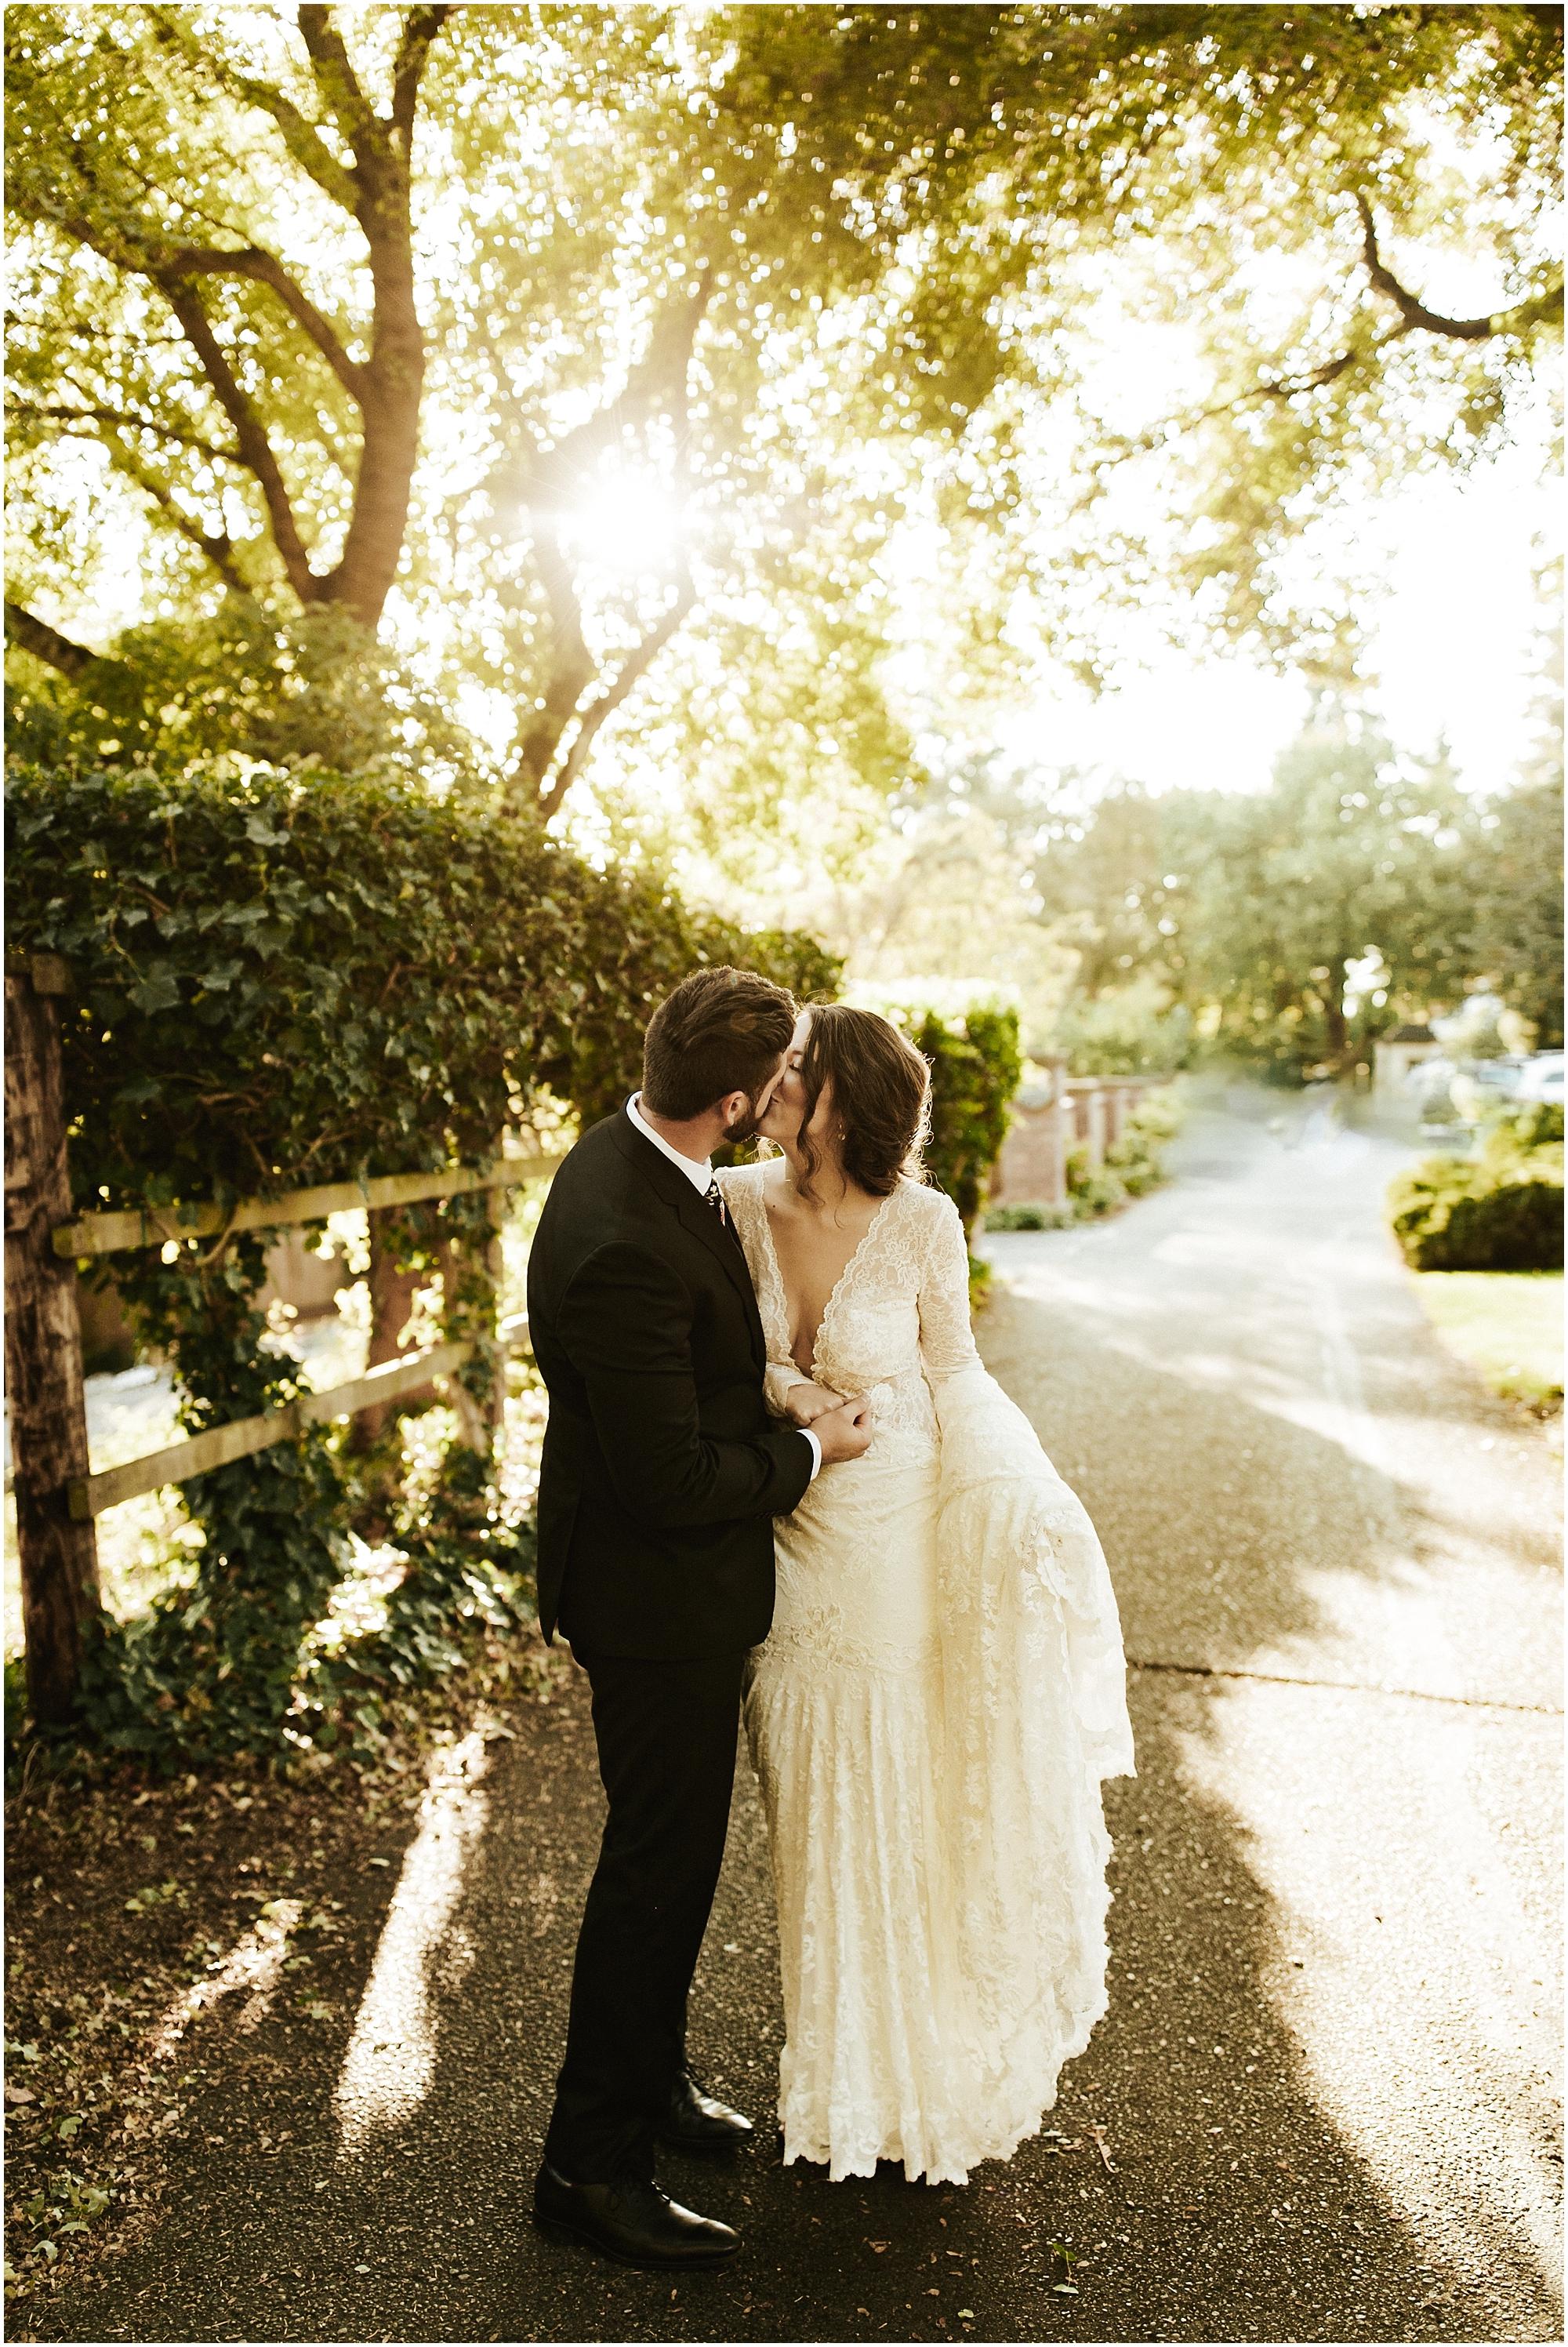 Lairmont Manor Wedding Bellingham Cassie Trottier Photo1100.jpg